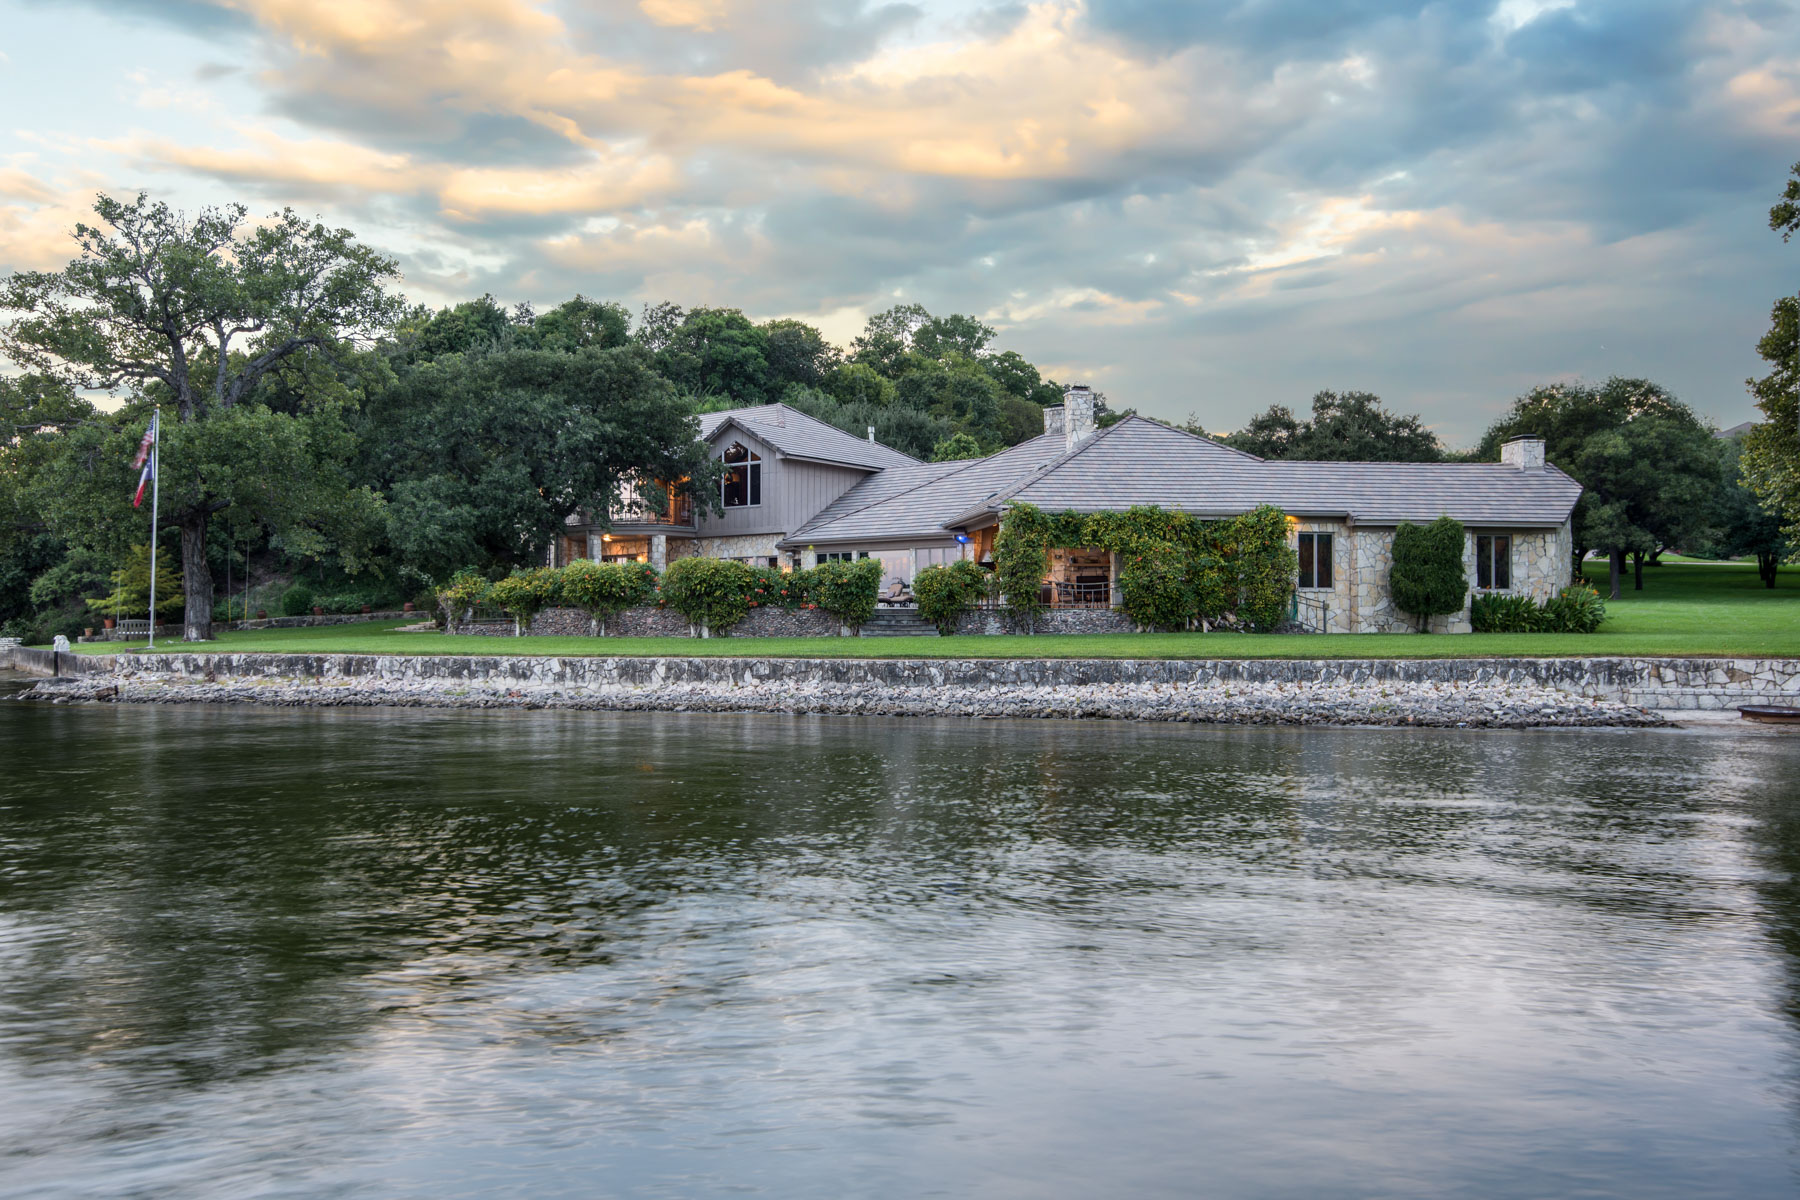 独户住宅 为 销售 在 Eagle Mountain Lake Waterfront Jewel 9900 Boat Club Road 沃斯堡市, 得克萨斯州, 76179 美国